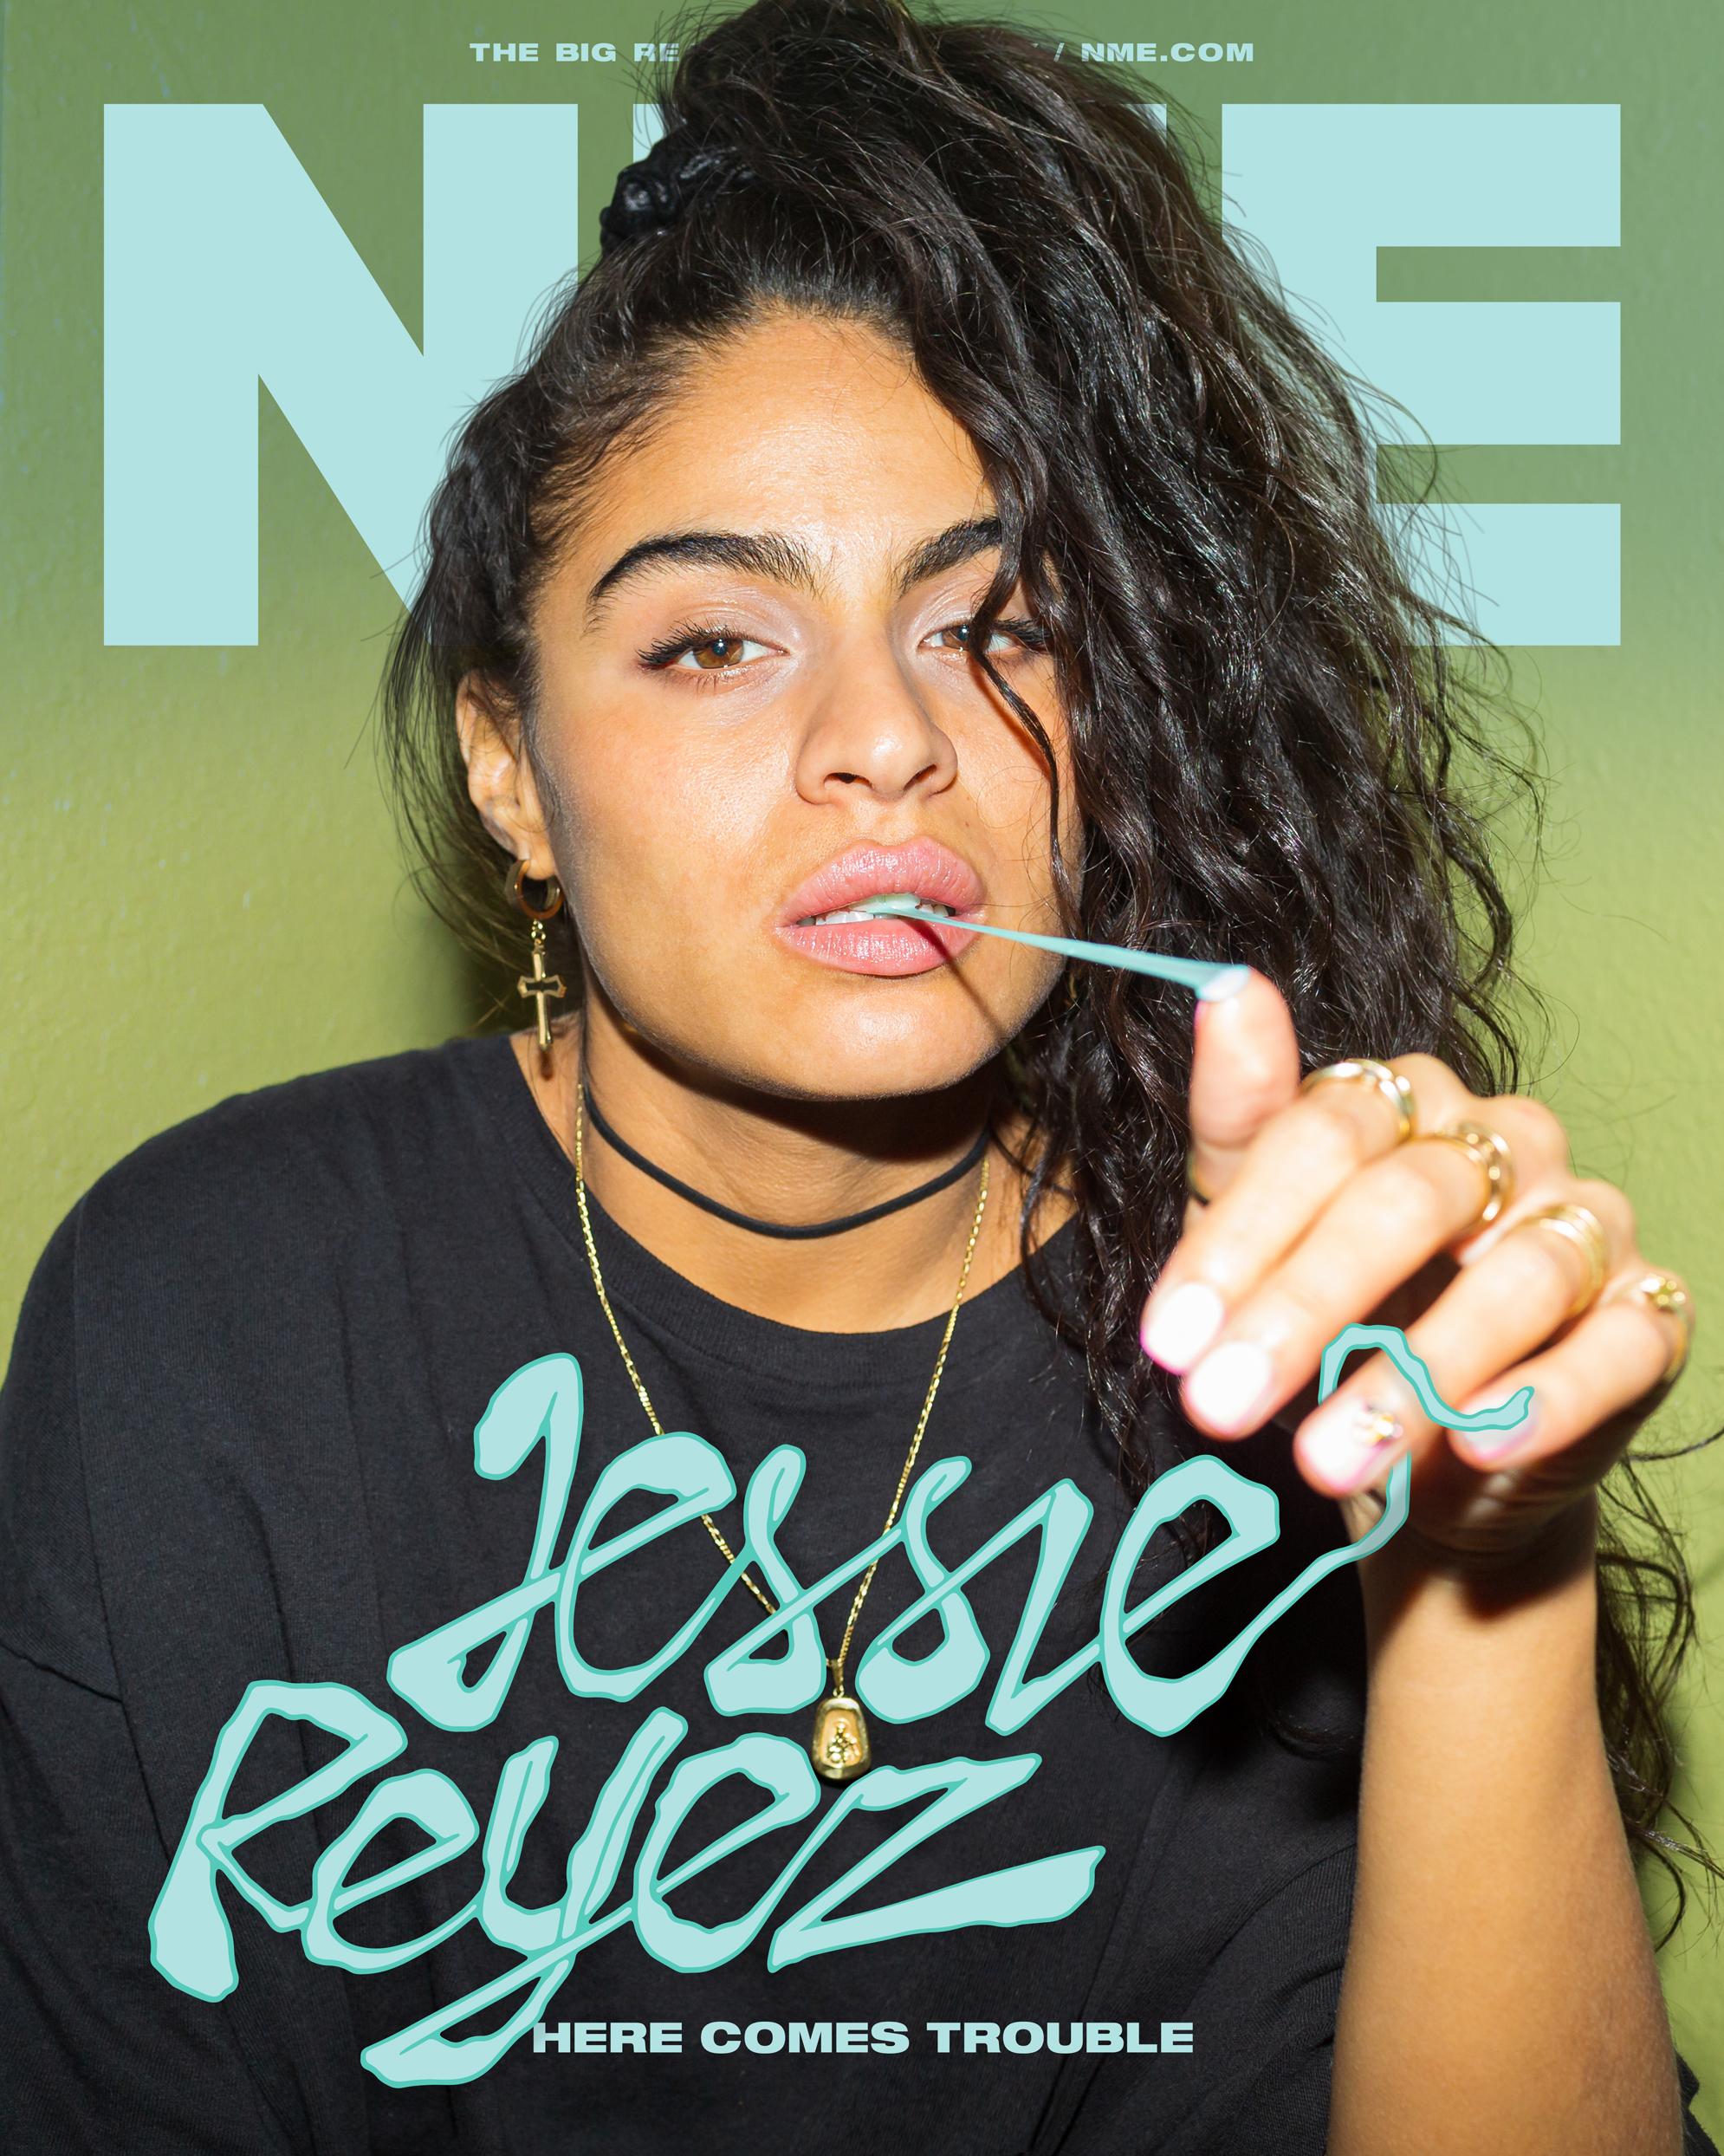 jessie reyez nme cover interview